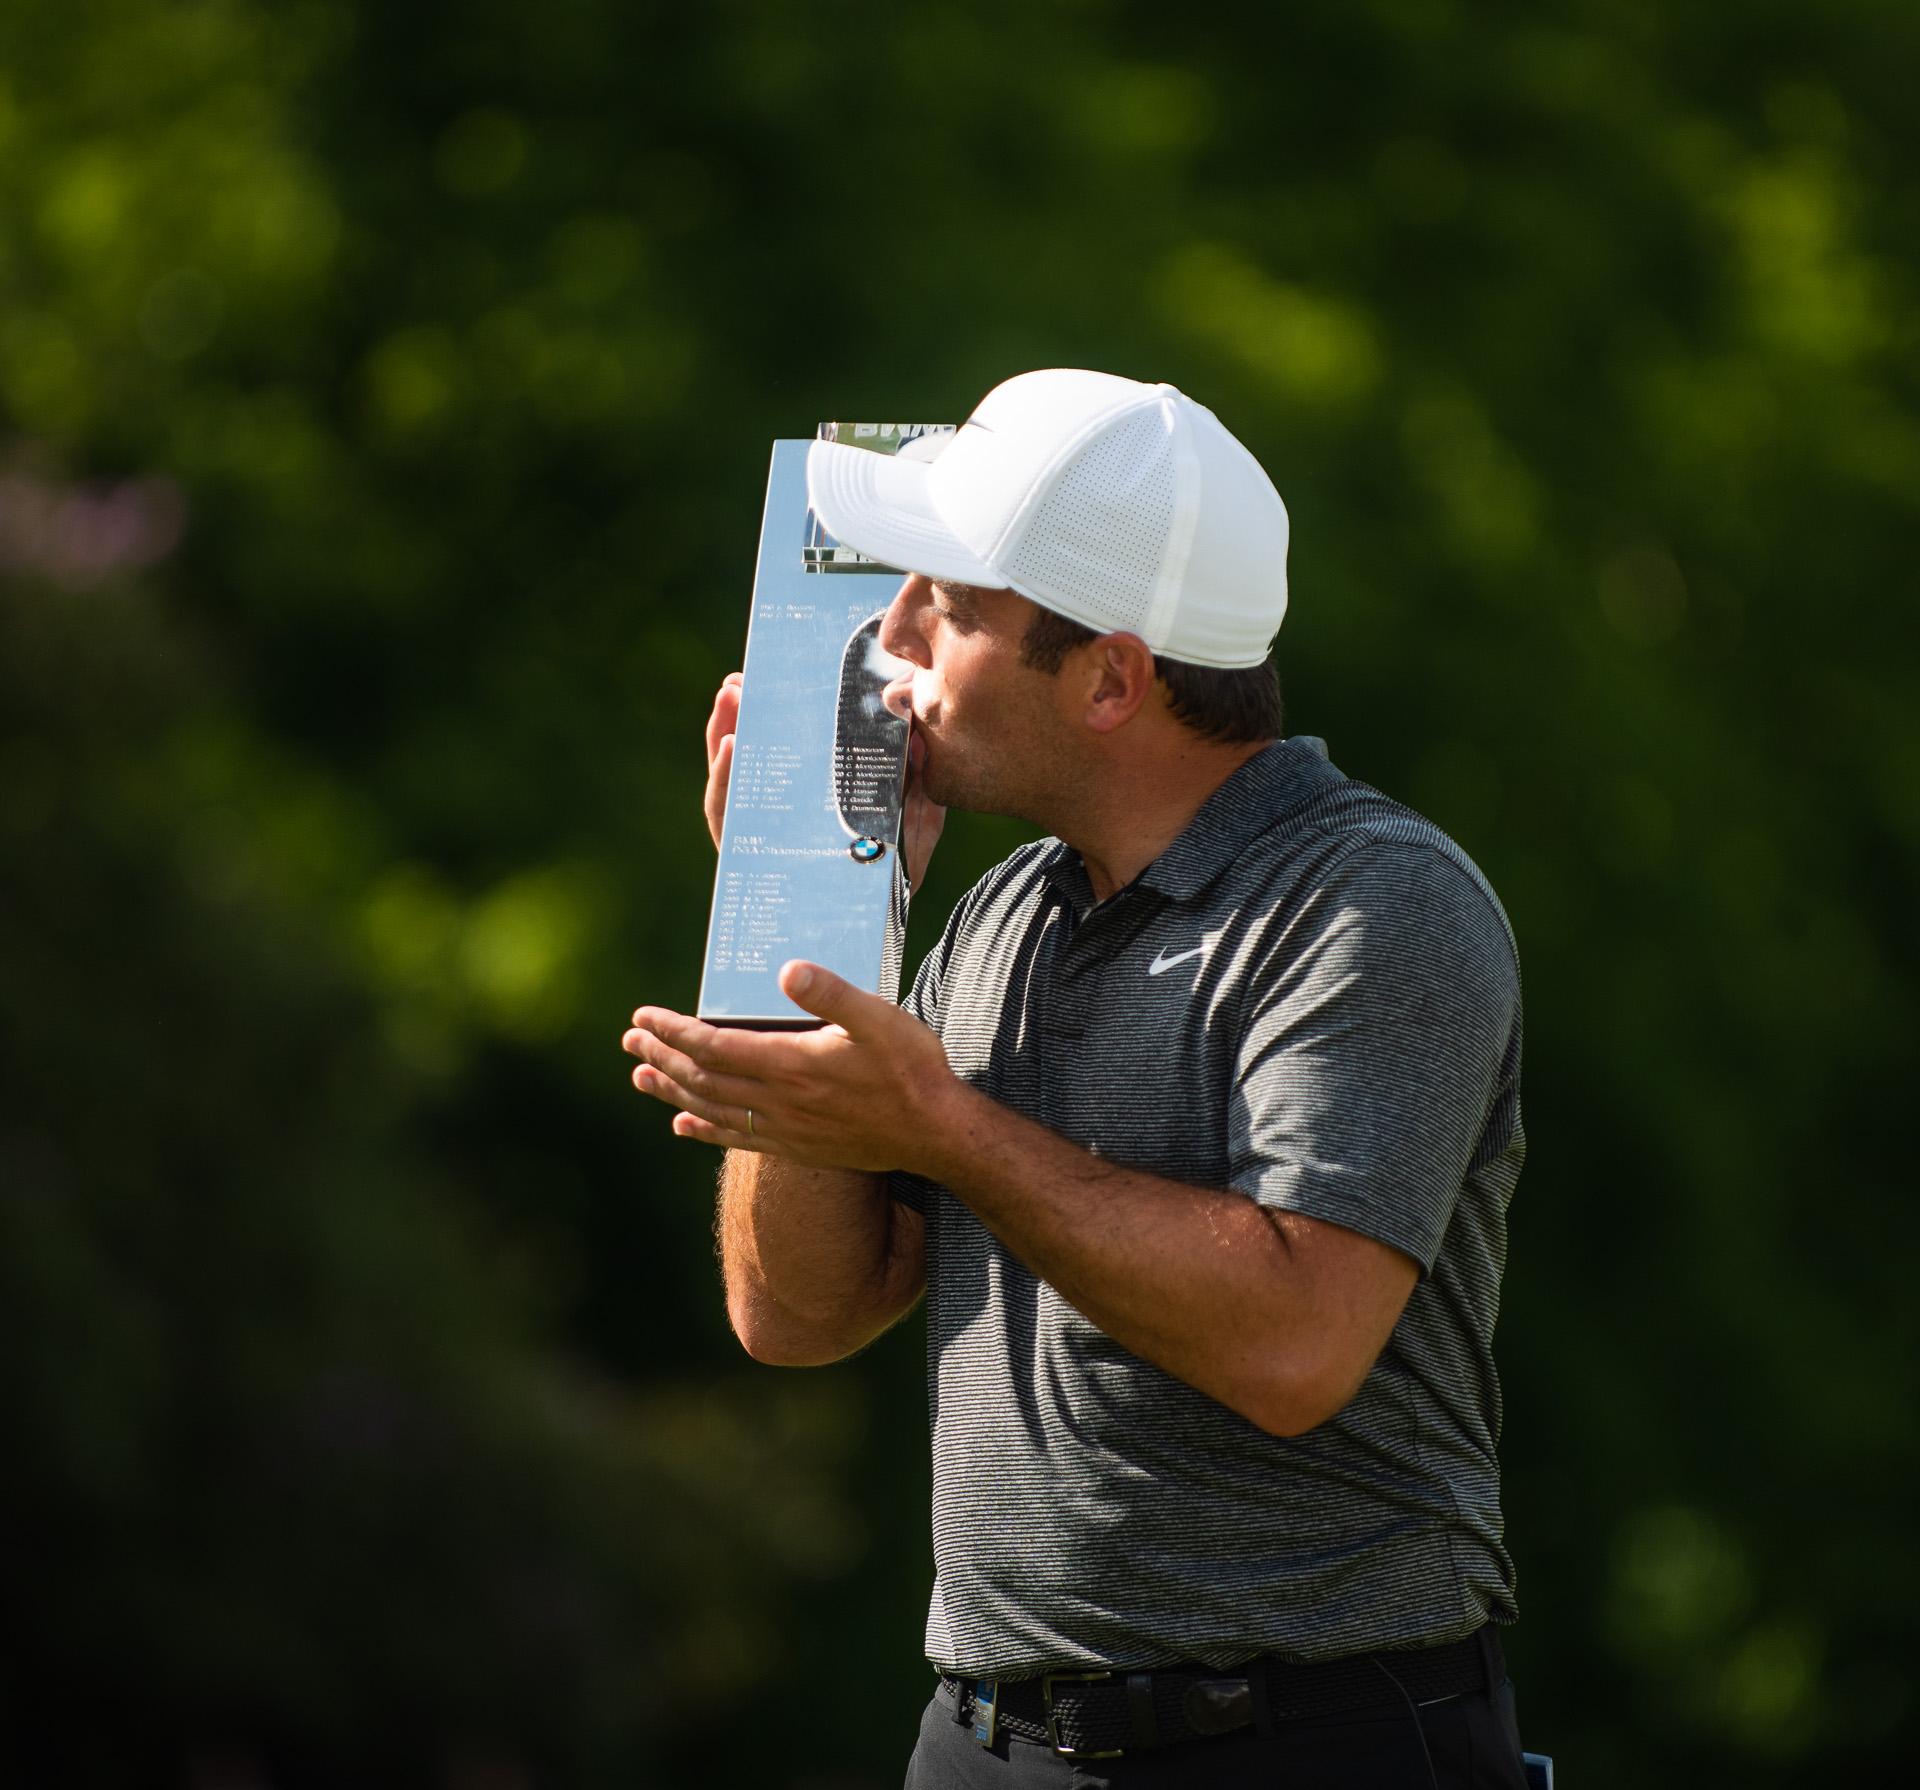 The third Italian to win the PGA Championship